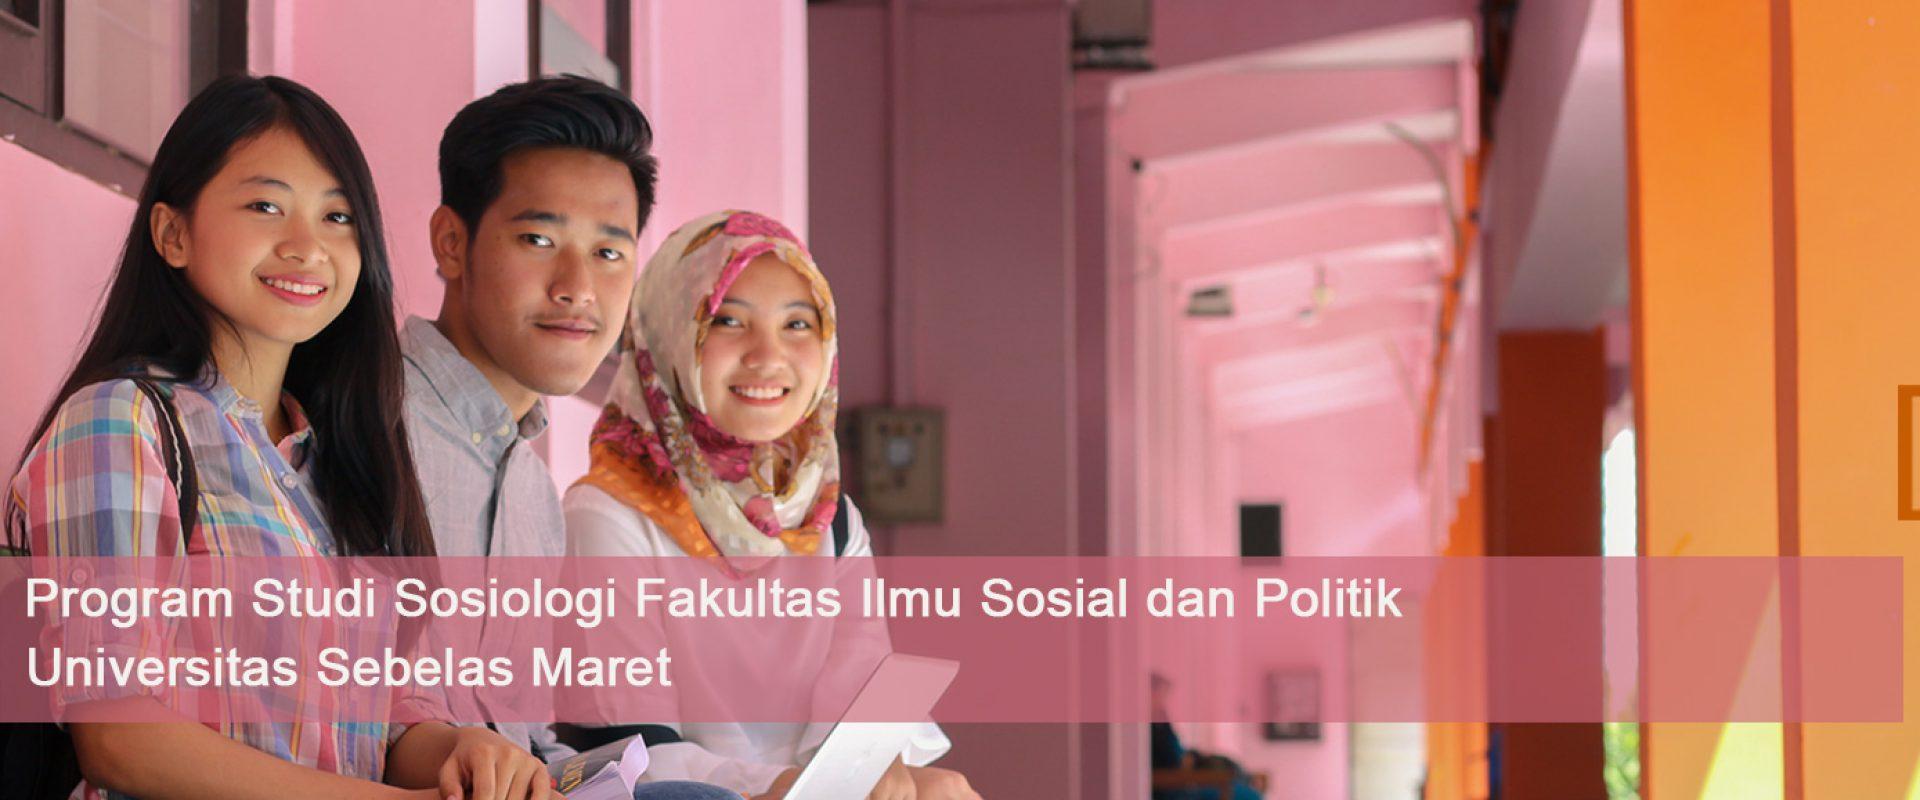 Sosiologi Fisip UNS